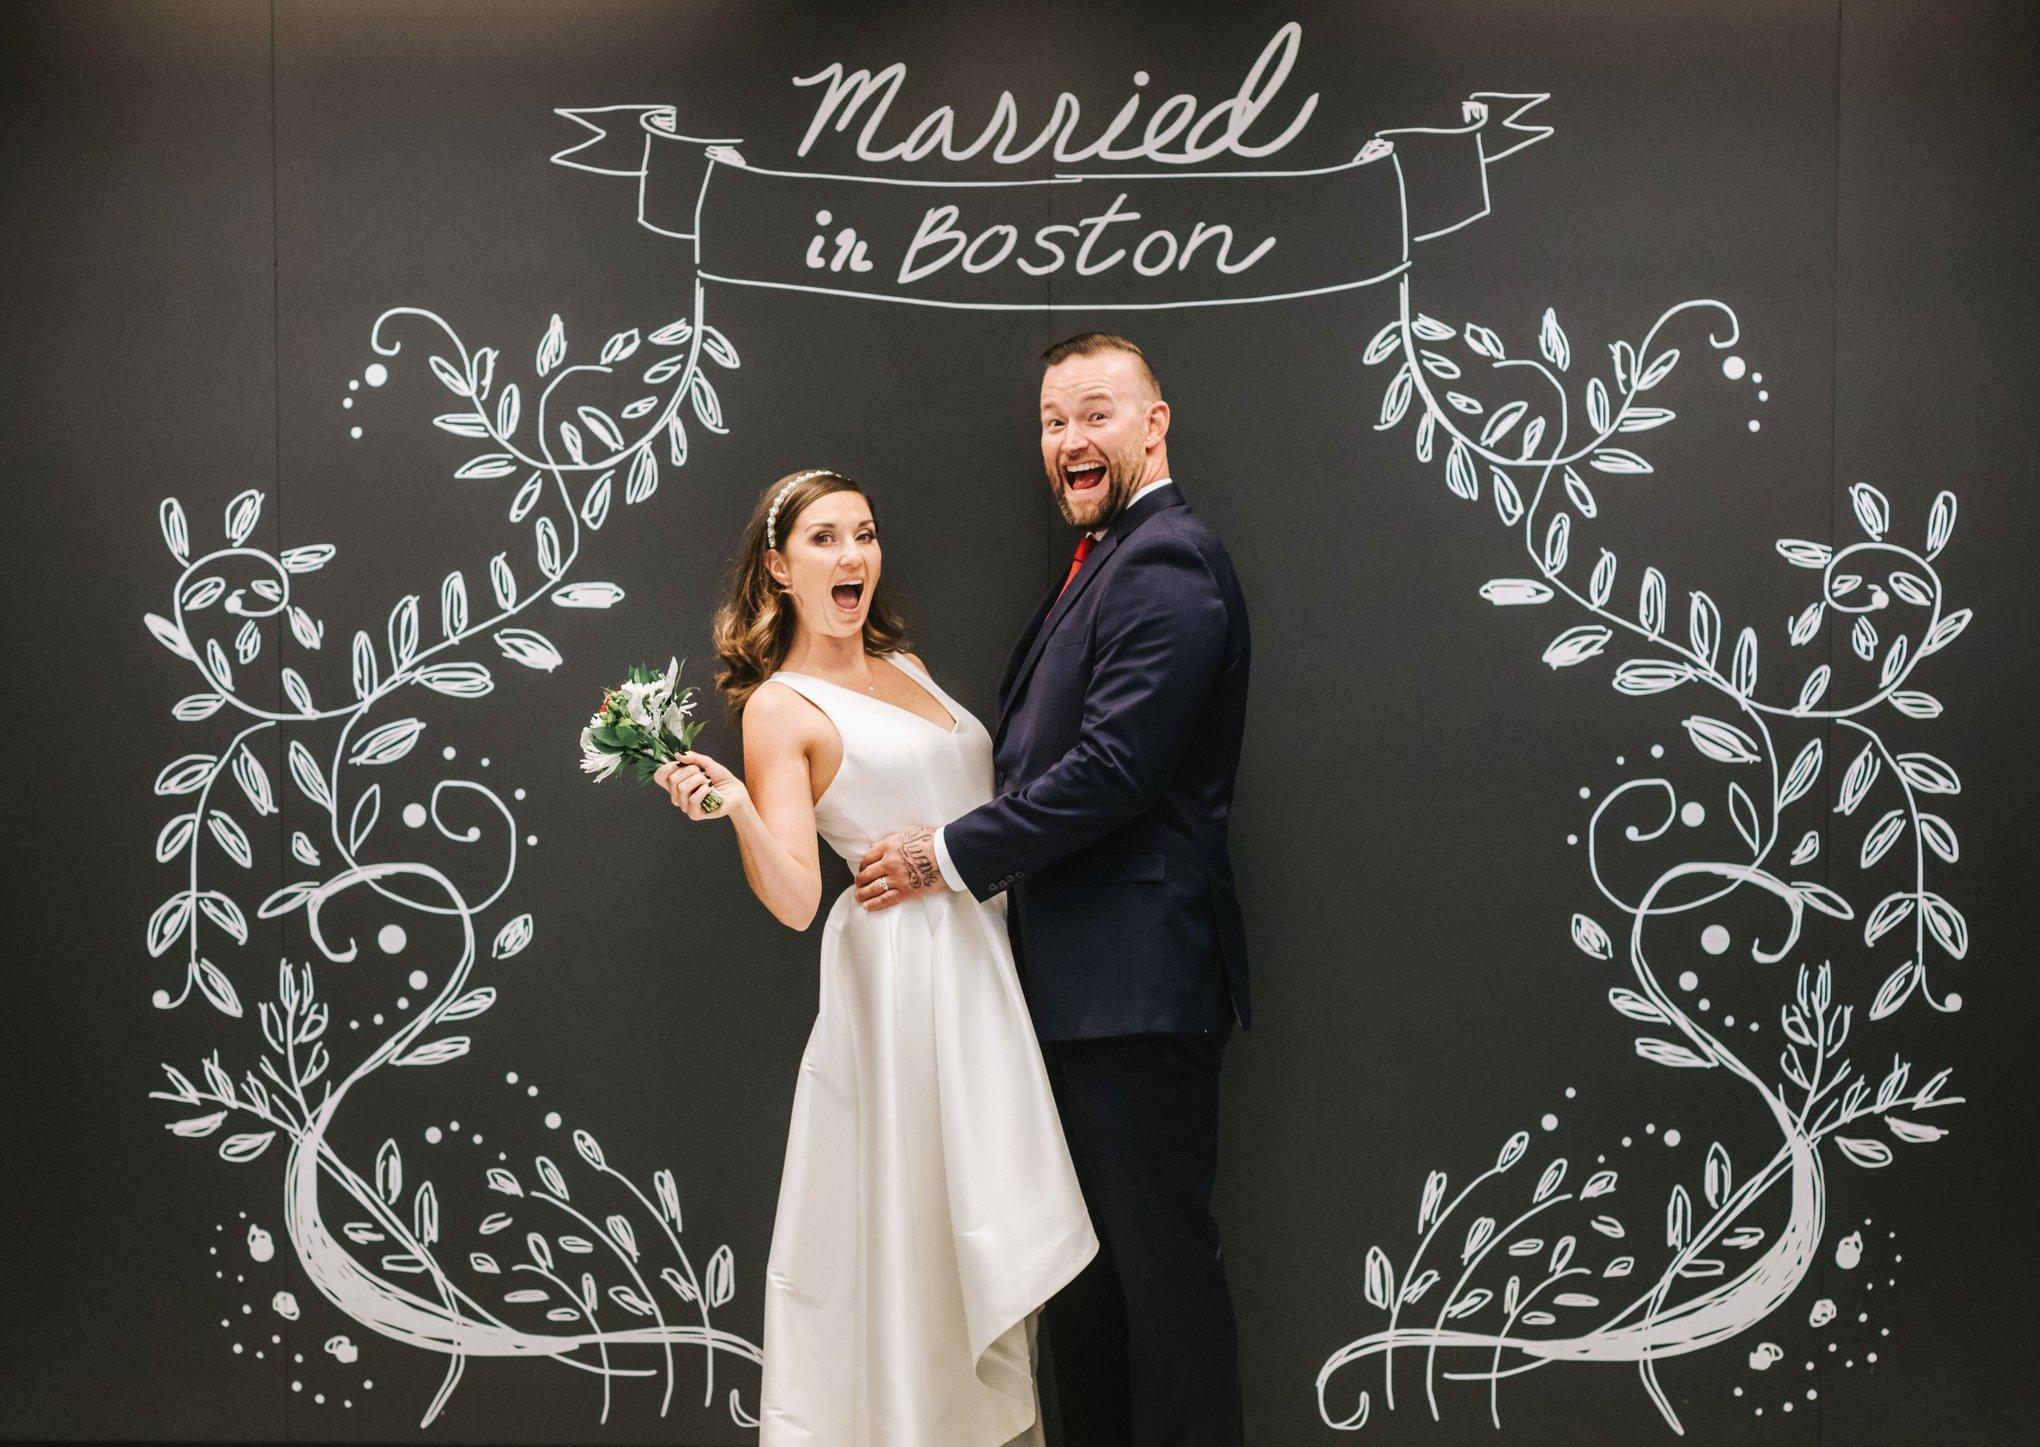 Boston-City-Hall-Wedding-Elopement-Photographer-Lena-Mirisola-4.JPG